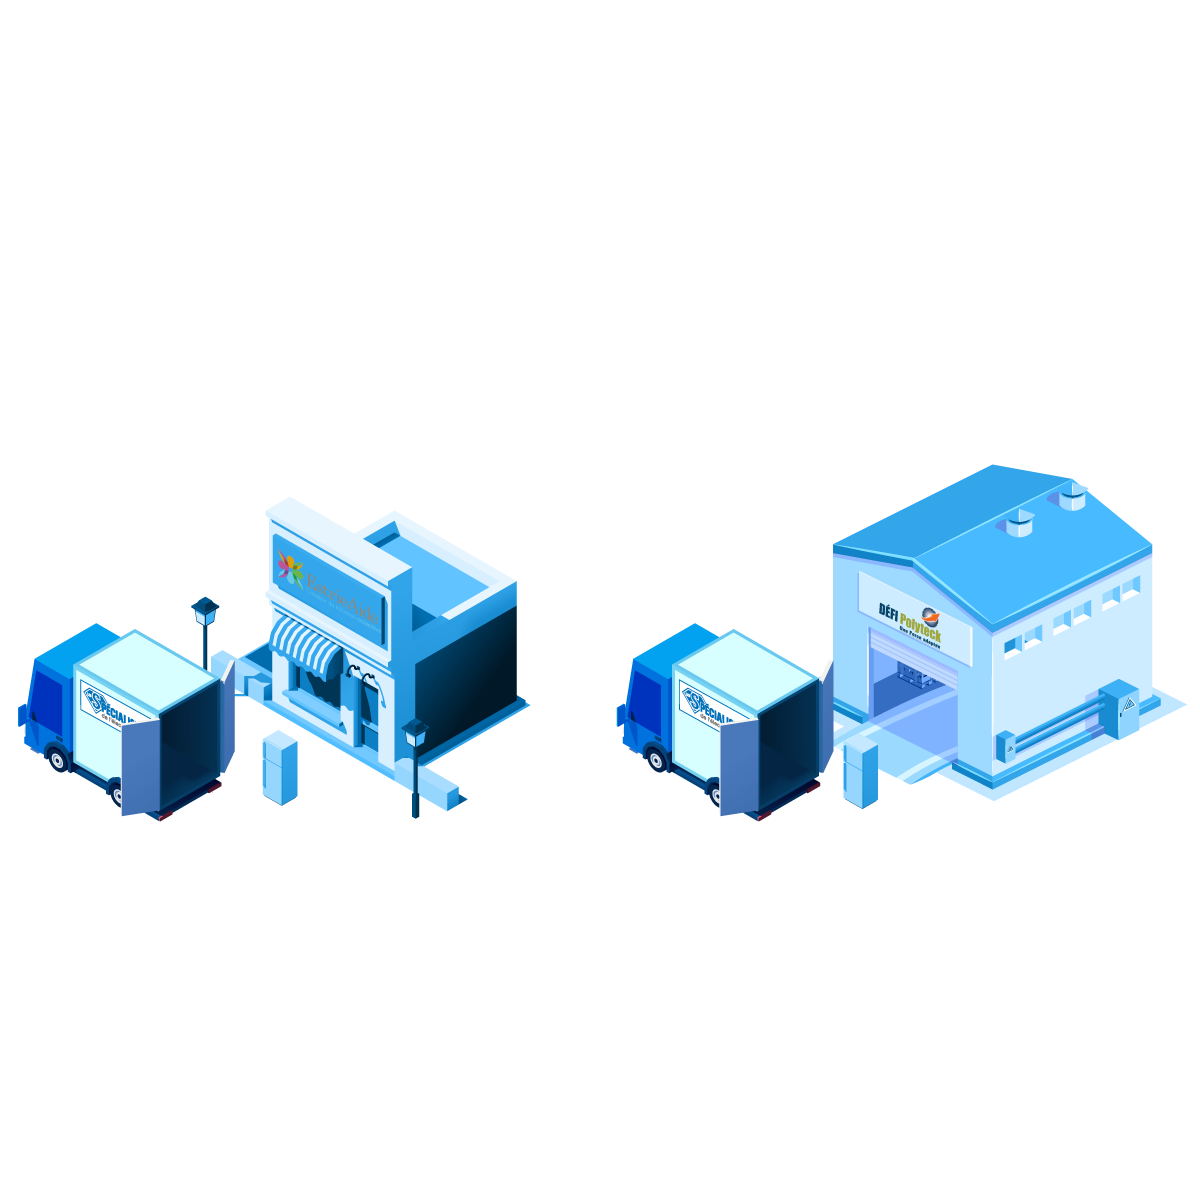 Illustration recyclage et revalorisation